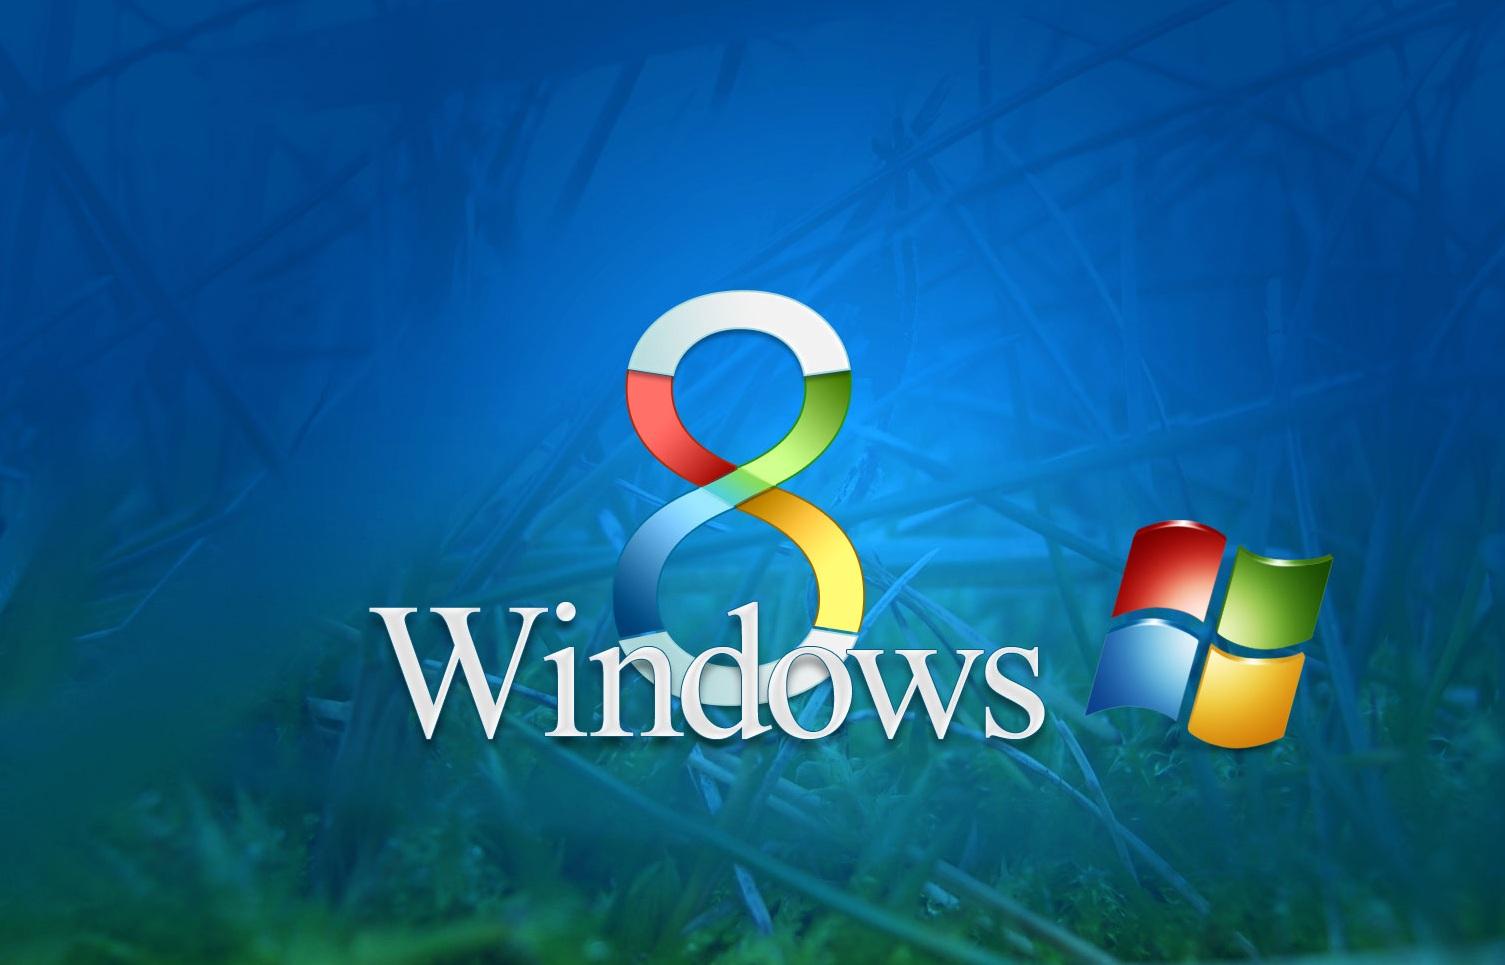 pics photos windows 8 - photo #17